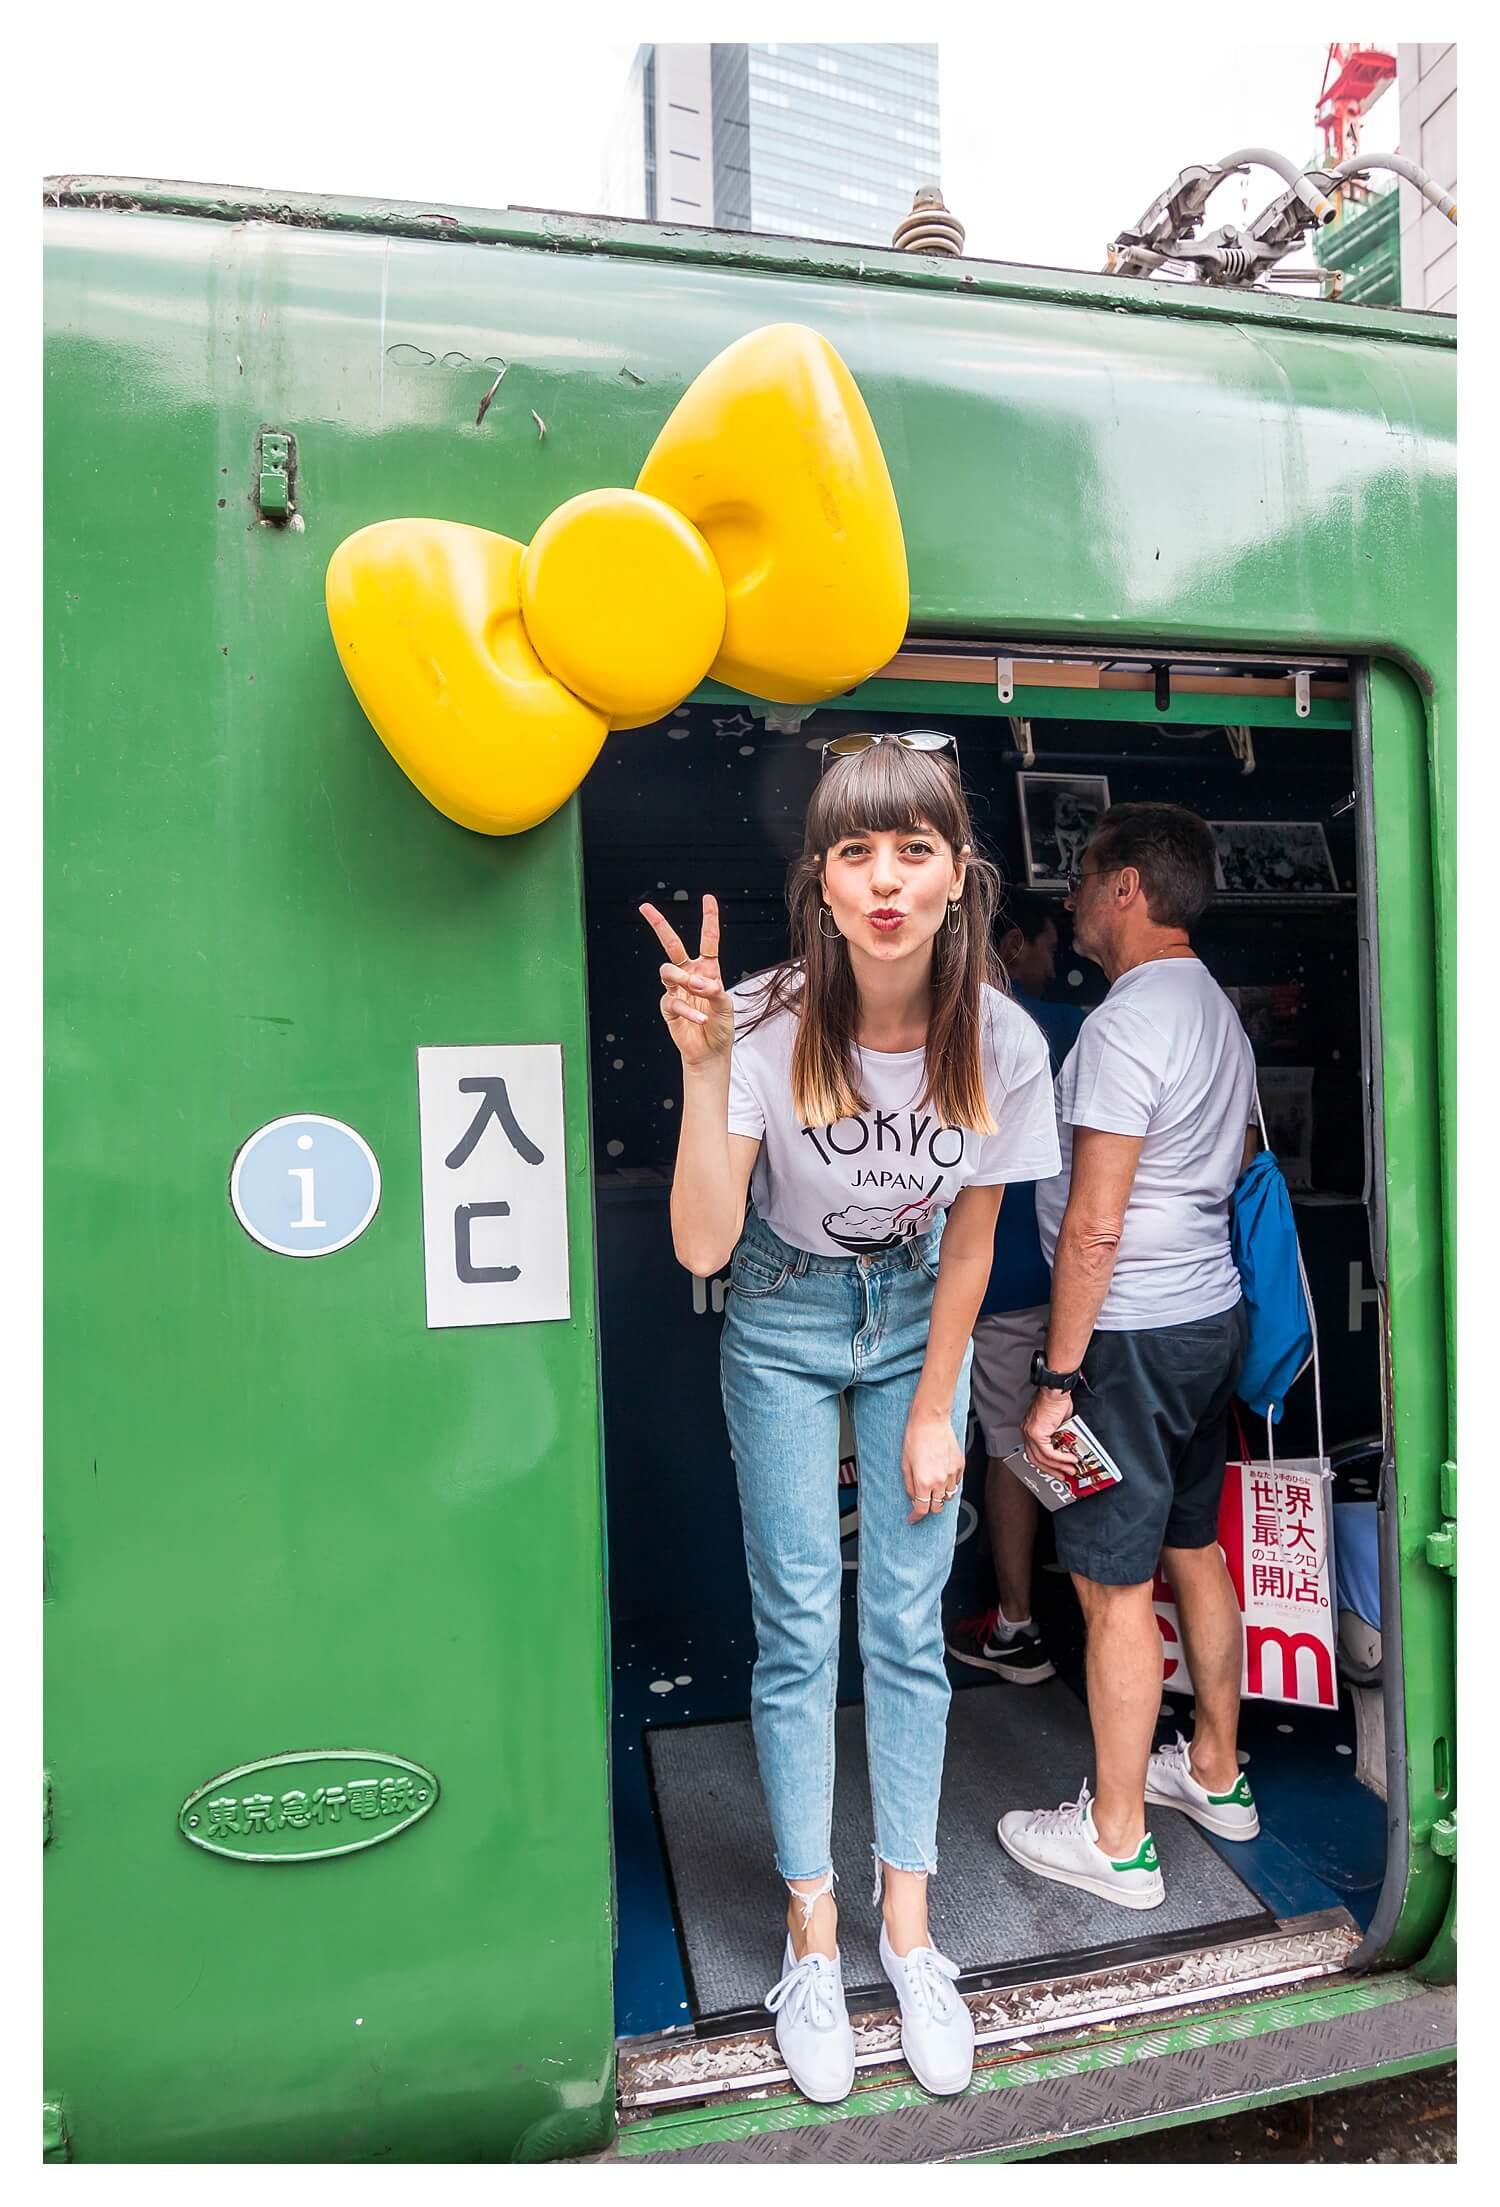 Things To Do In Tokyo, Japan - Shibuya | Hello Kitty